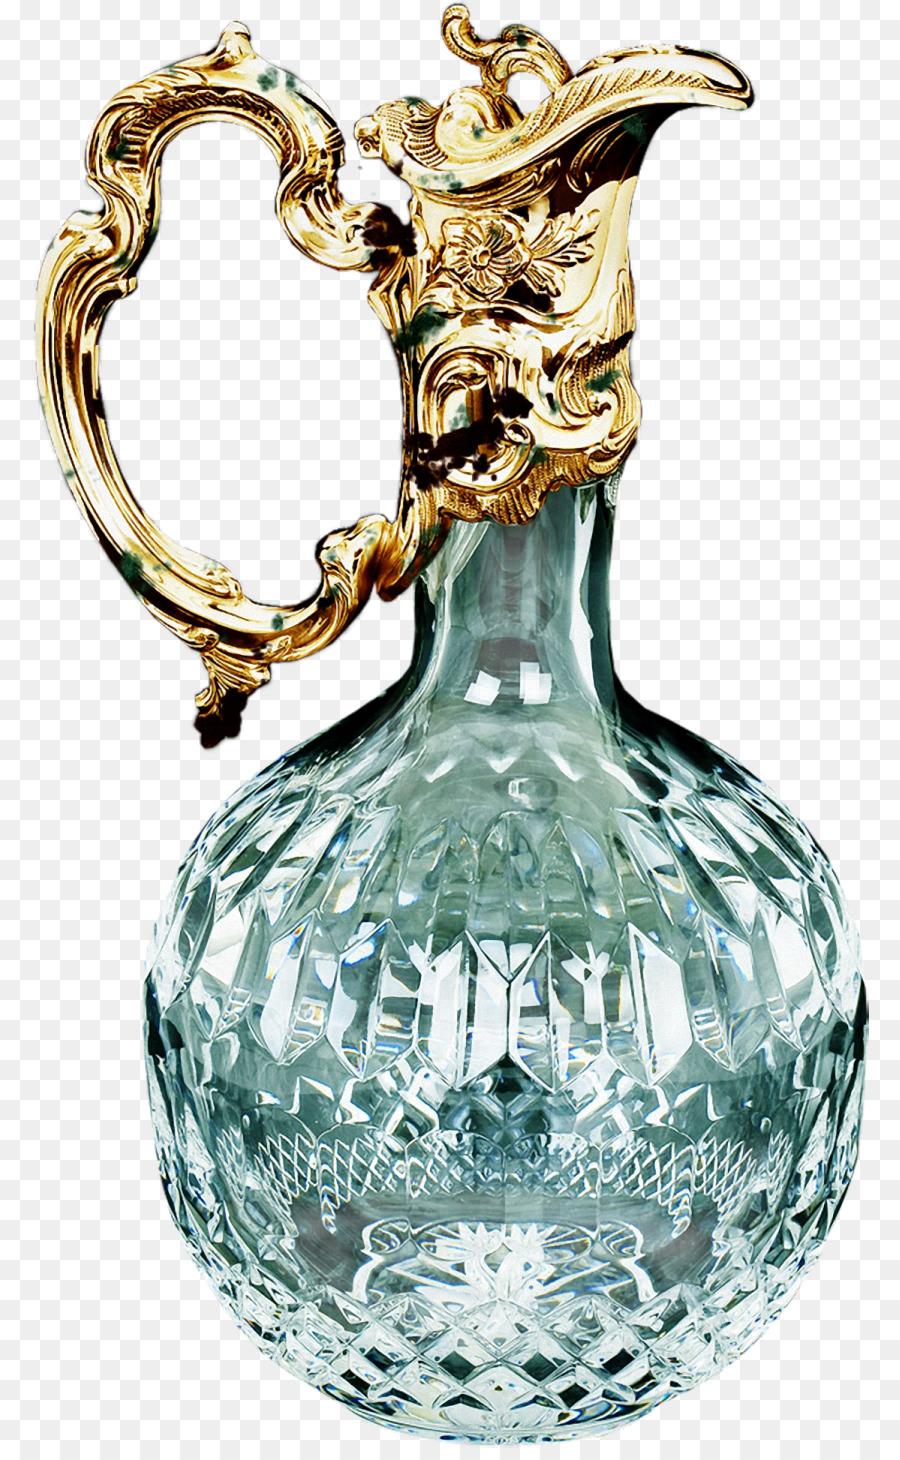 Jarrón De Cristal De Waterford Crystal Decanter Jarra - teal marco ...